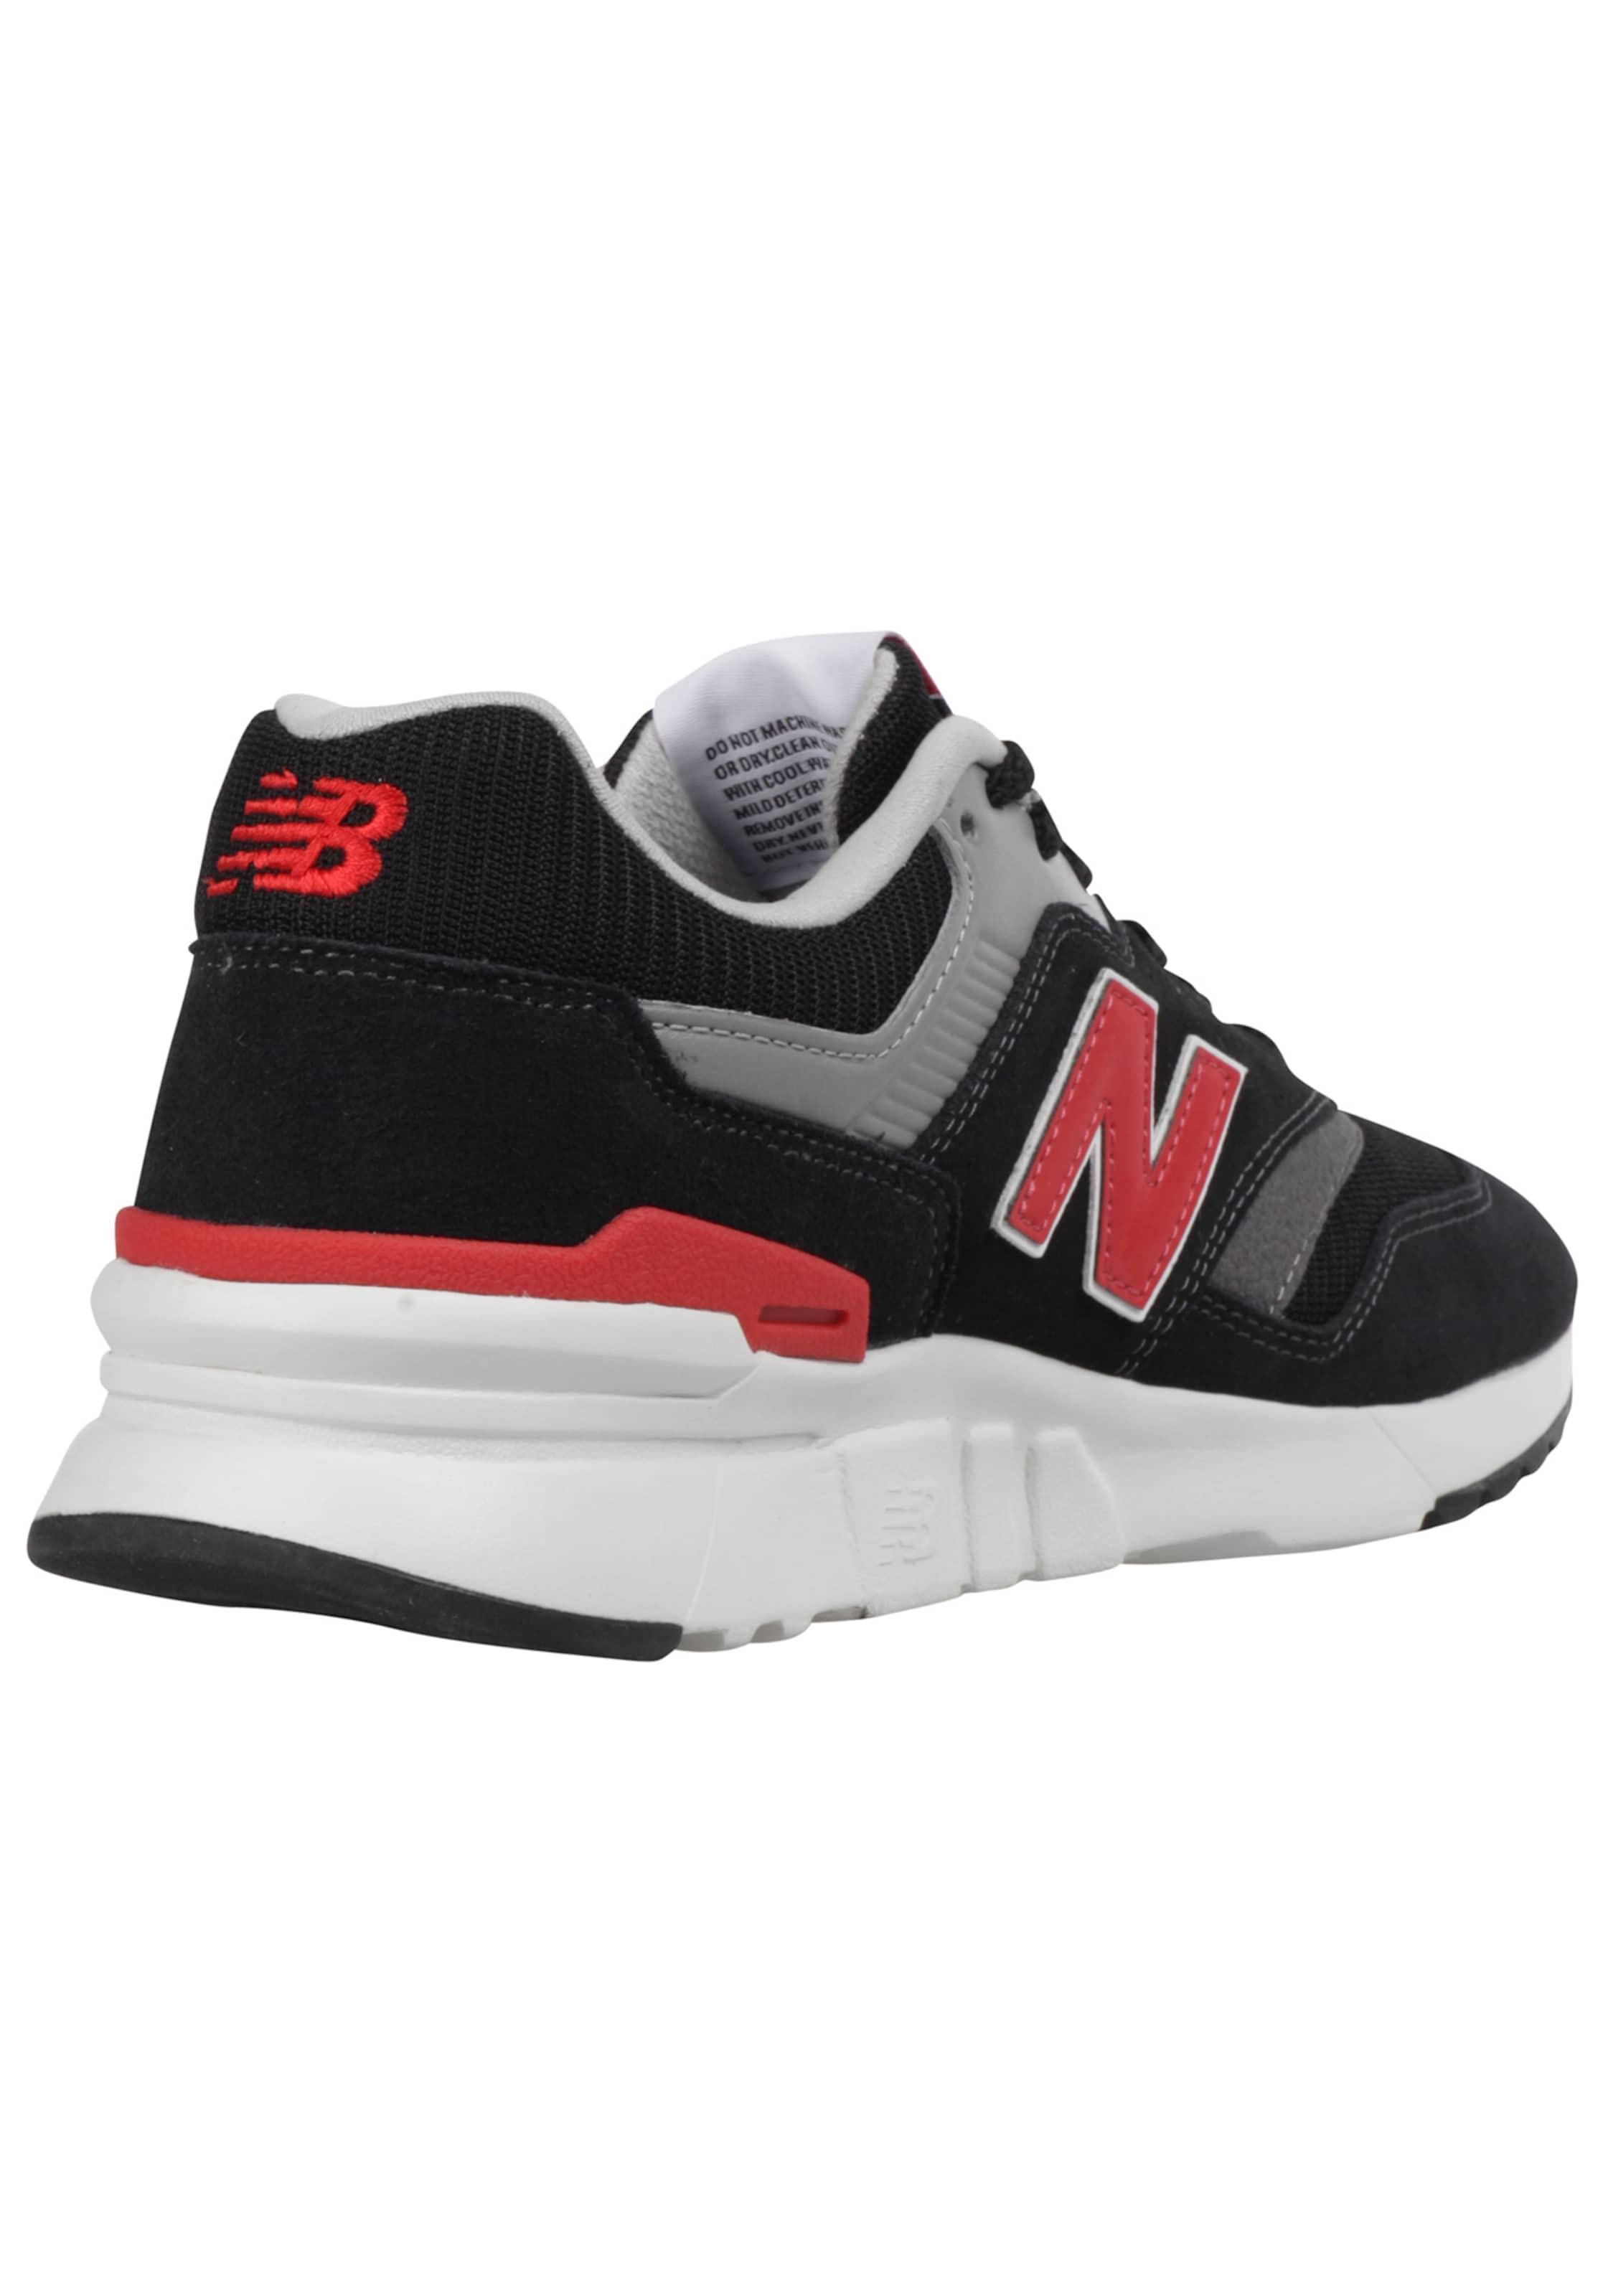 Schwarz New 'cm997' Sneaker Weiß GrauRot Balance In 8nkPNwXZ0O